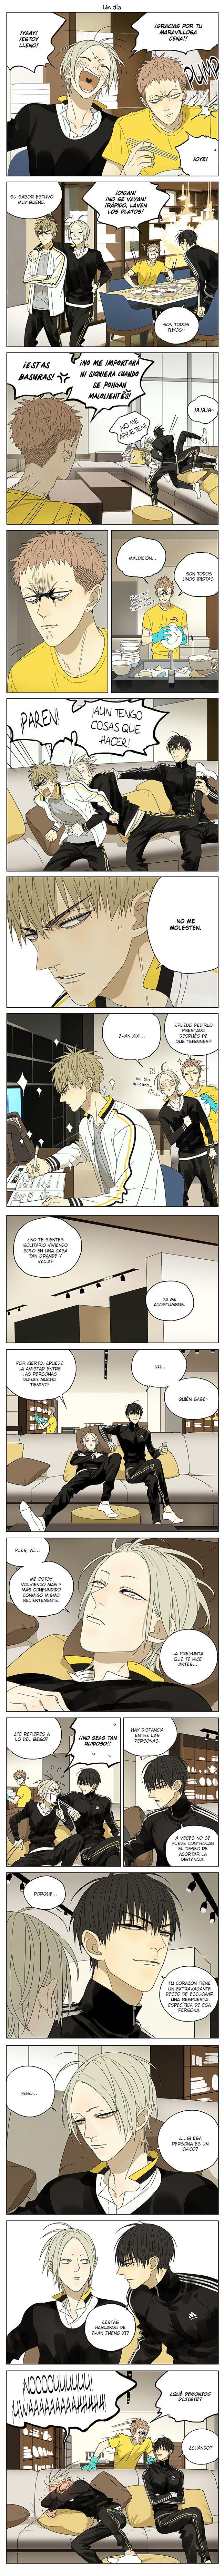 http://c5.ninemanga.com/es_manga/pic2/7/15943/527570/1892f4d2cffabf76d20fc619c2a696c8.jpg Page 1